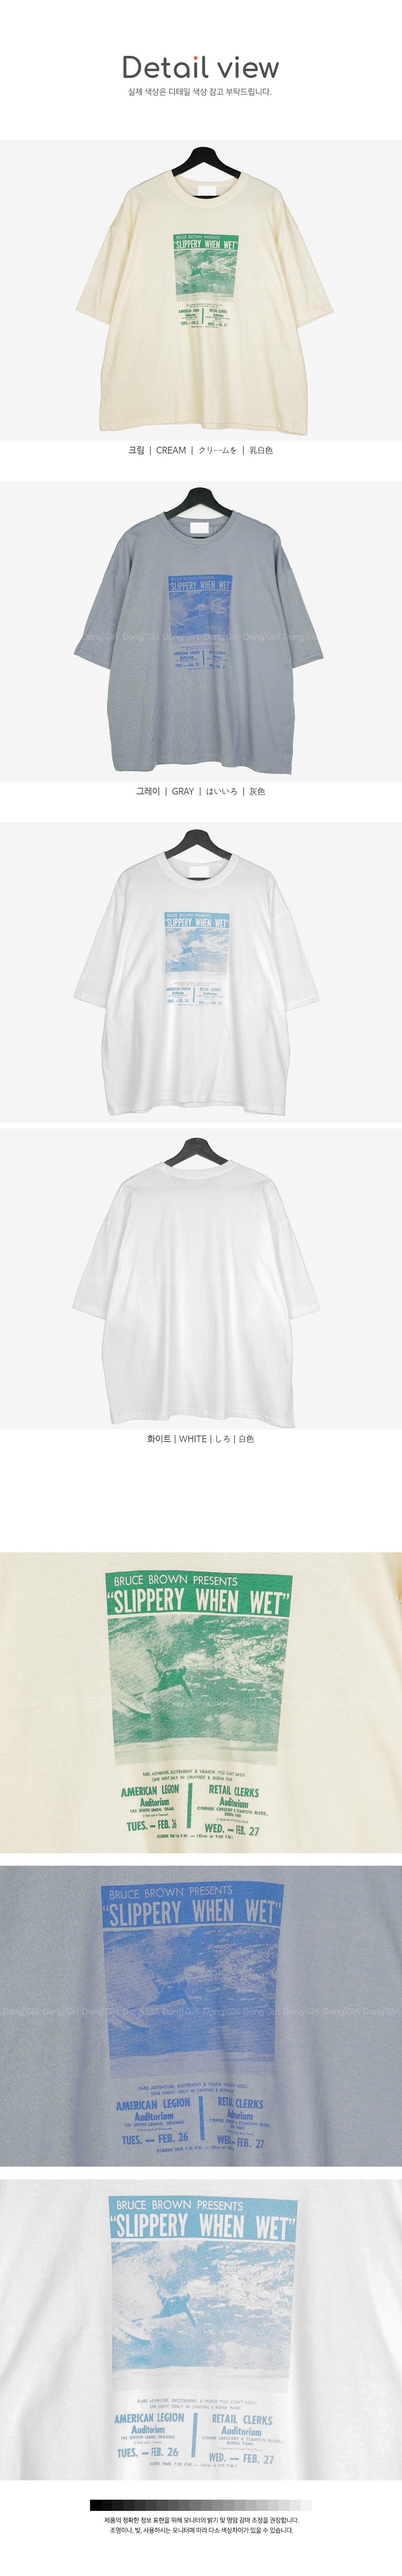 Big Size 55-120 Surf Over Fit Short Sleeve T-shirt